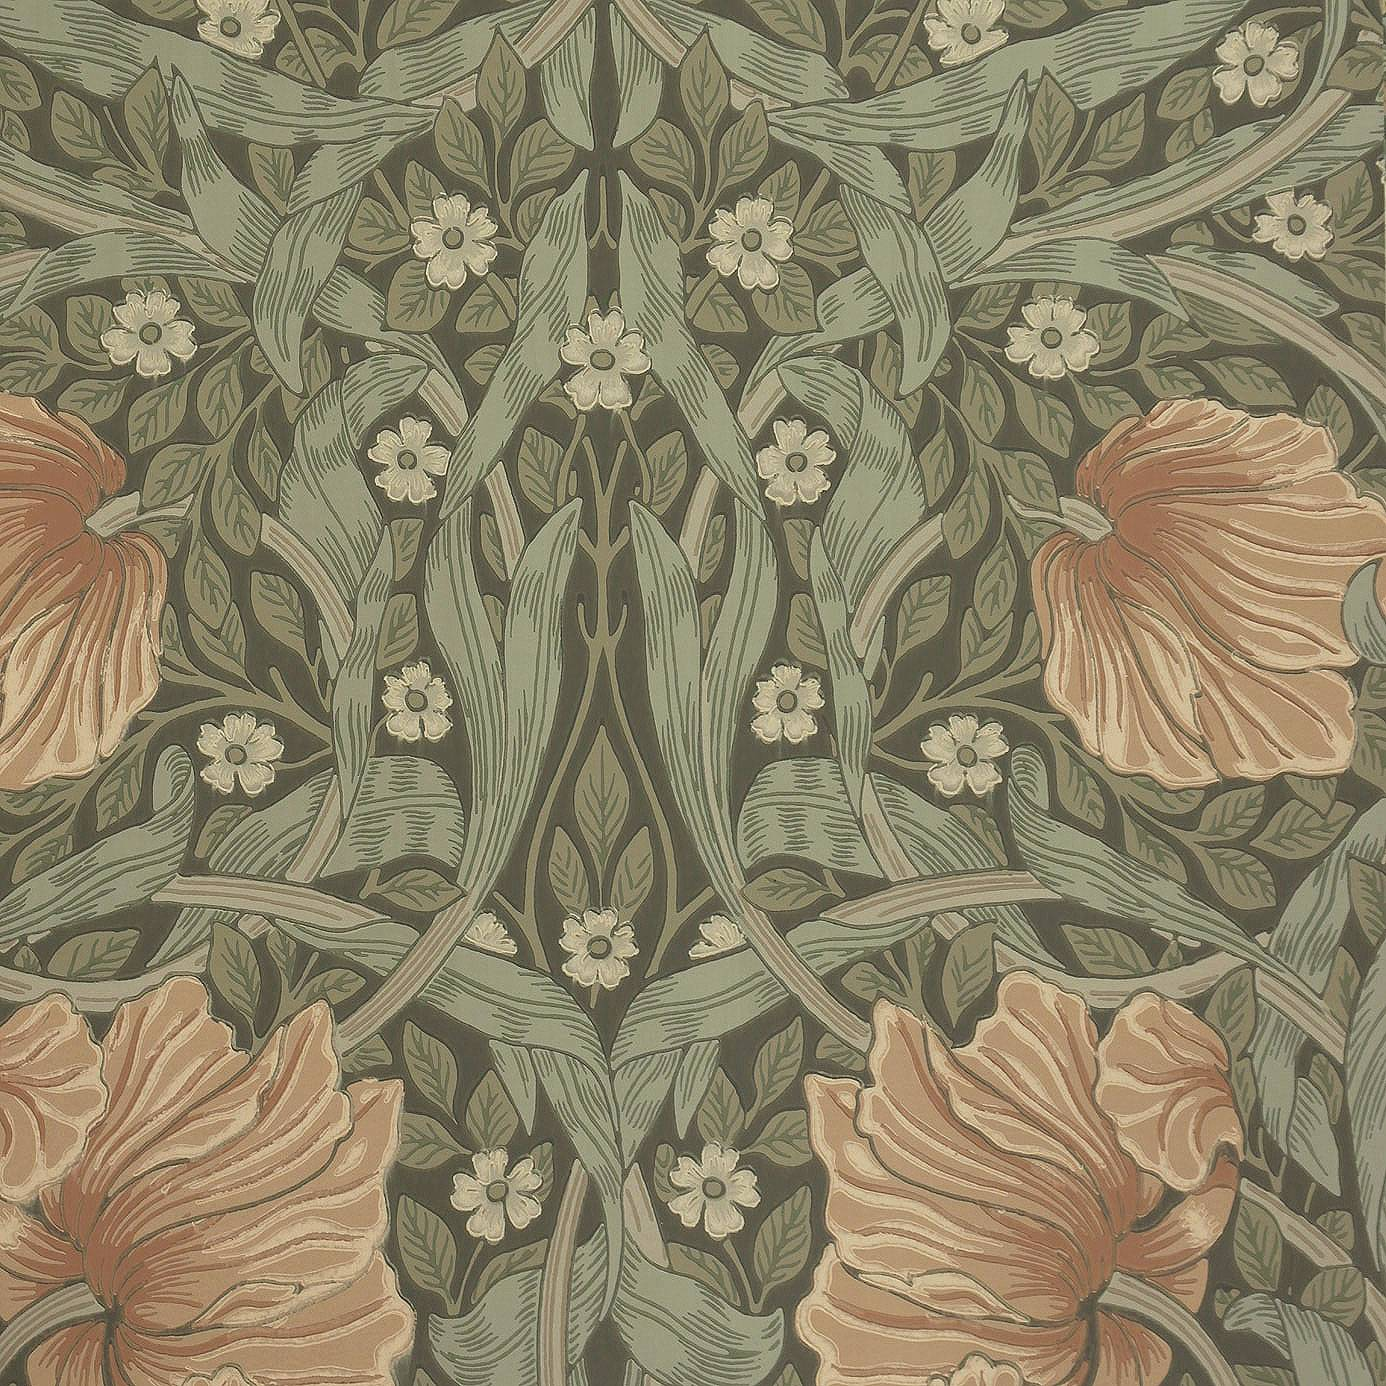 William Morris Wallpaper: Pimpernel Wallpaper Bayleaf/Manilla (210388)